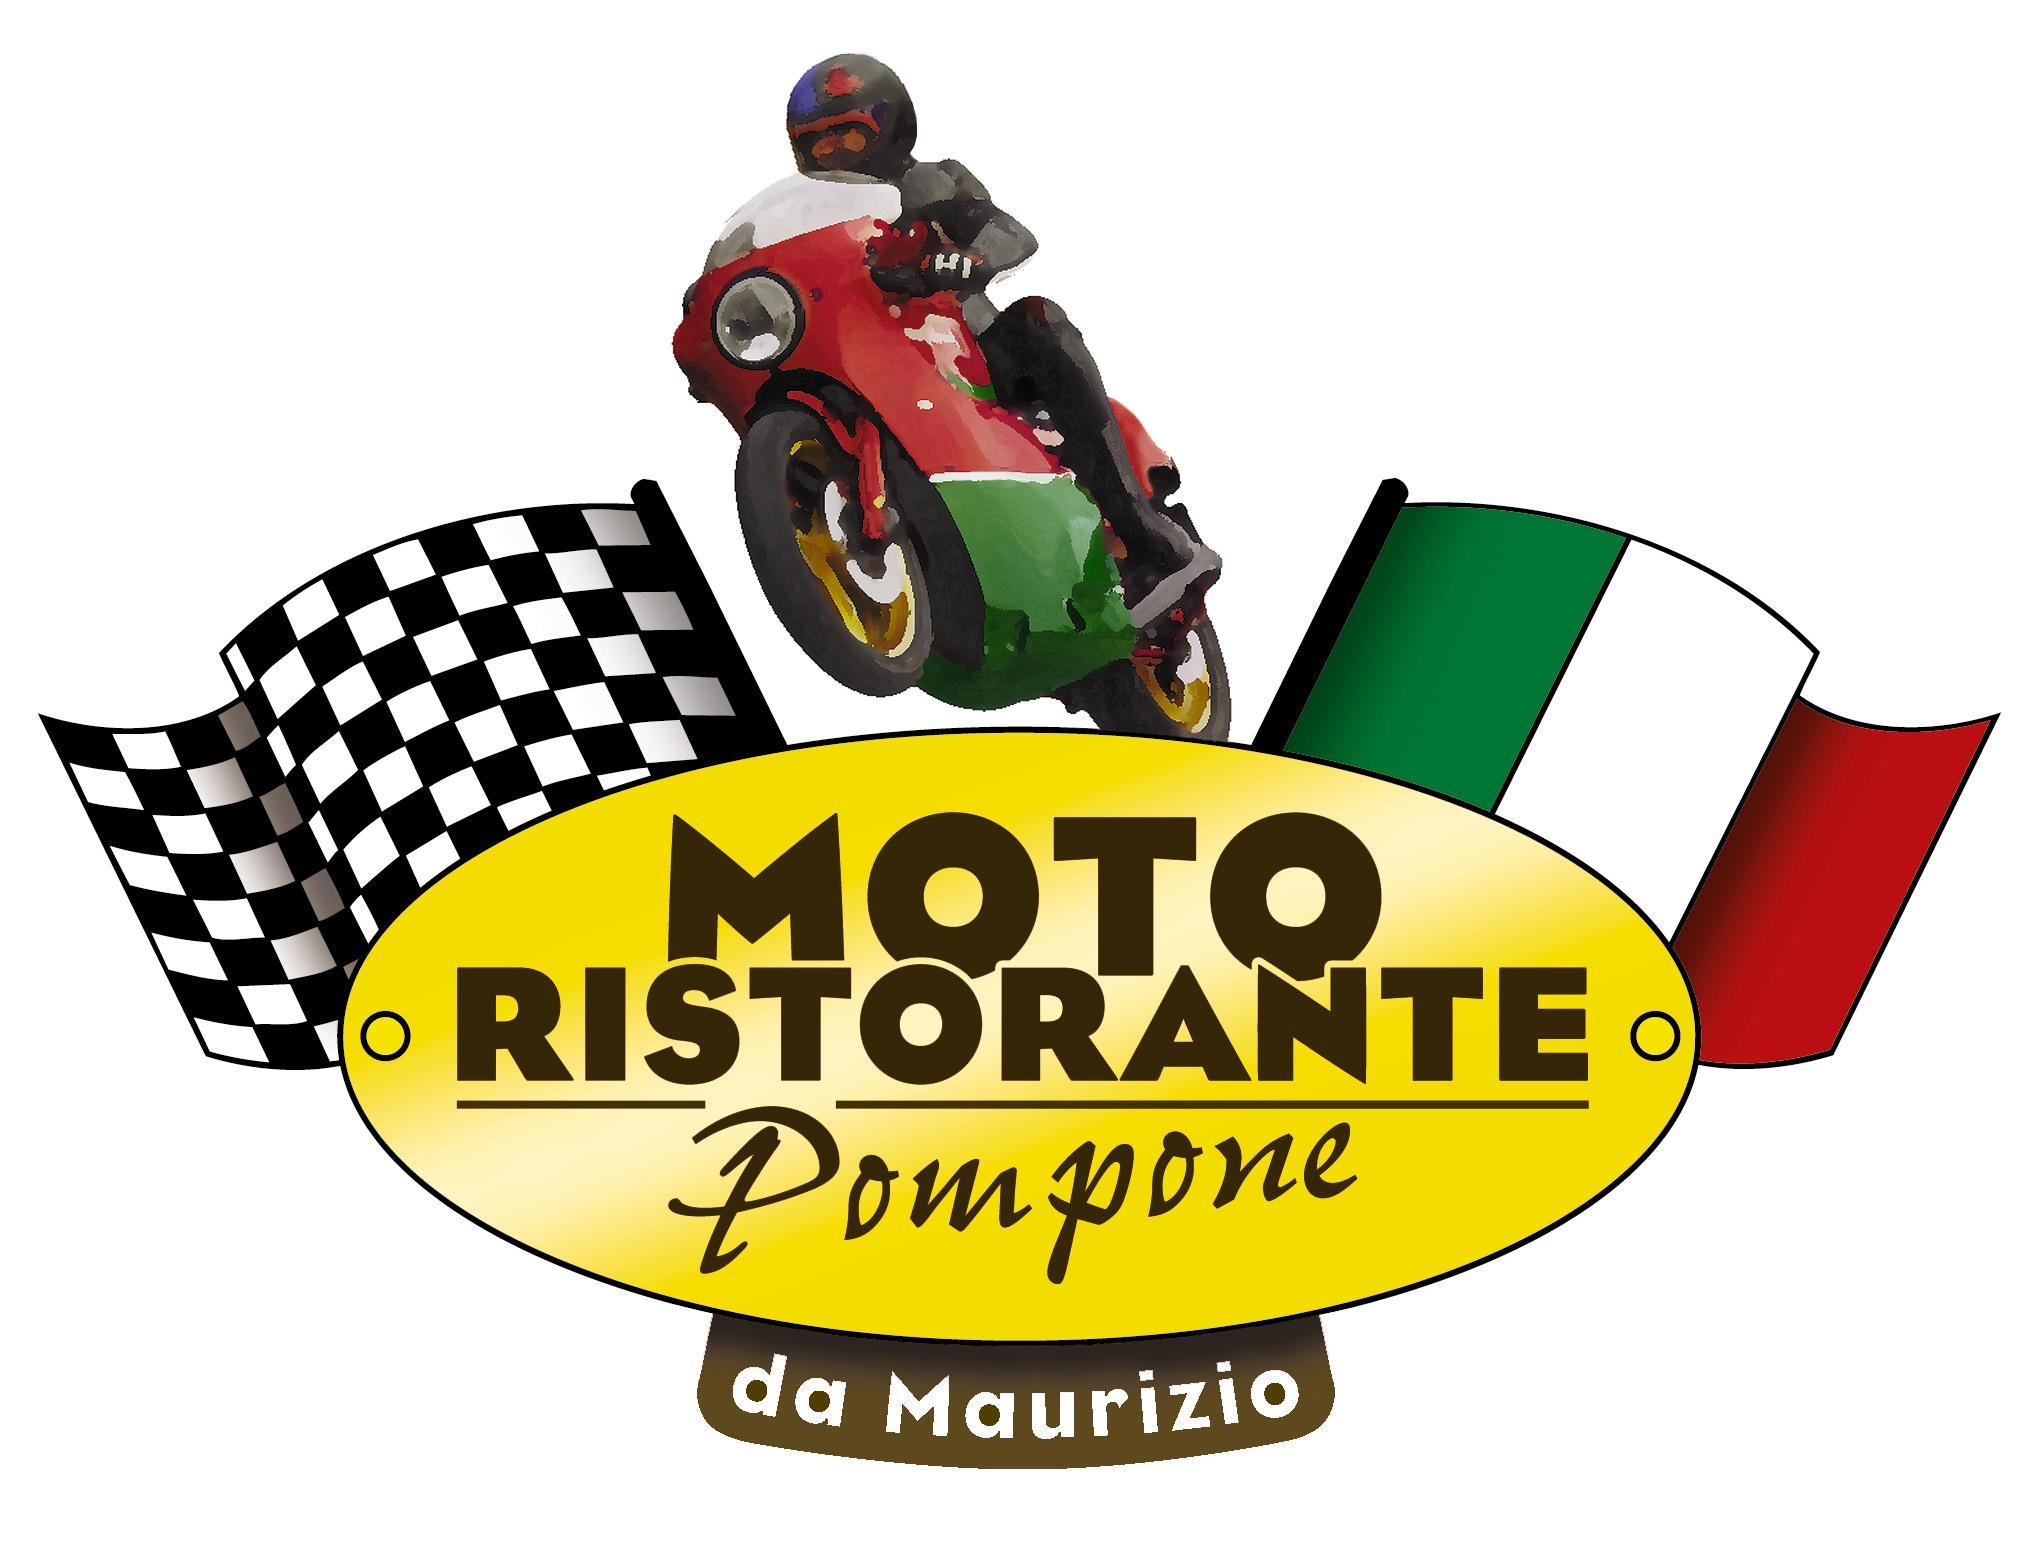 MOTORISTORANTE DA MAURIZIO